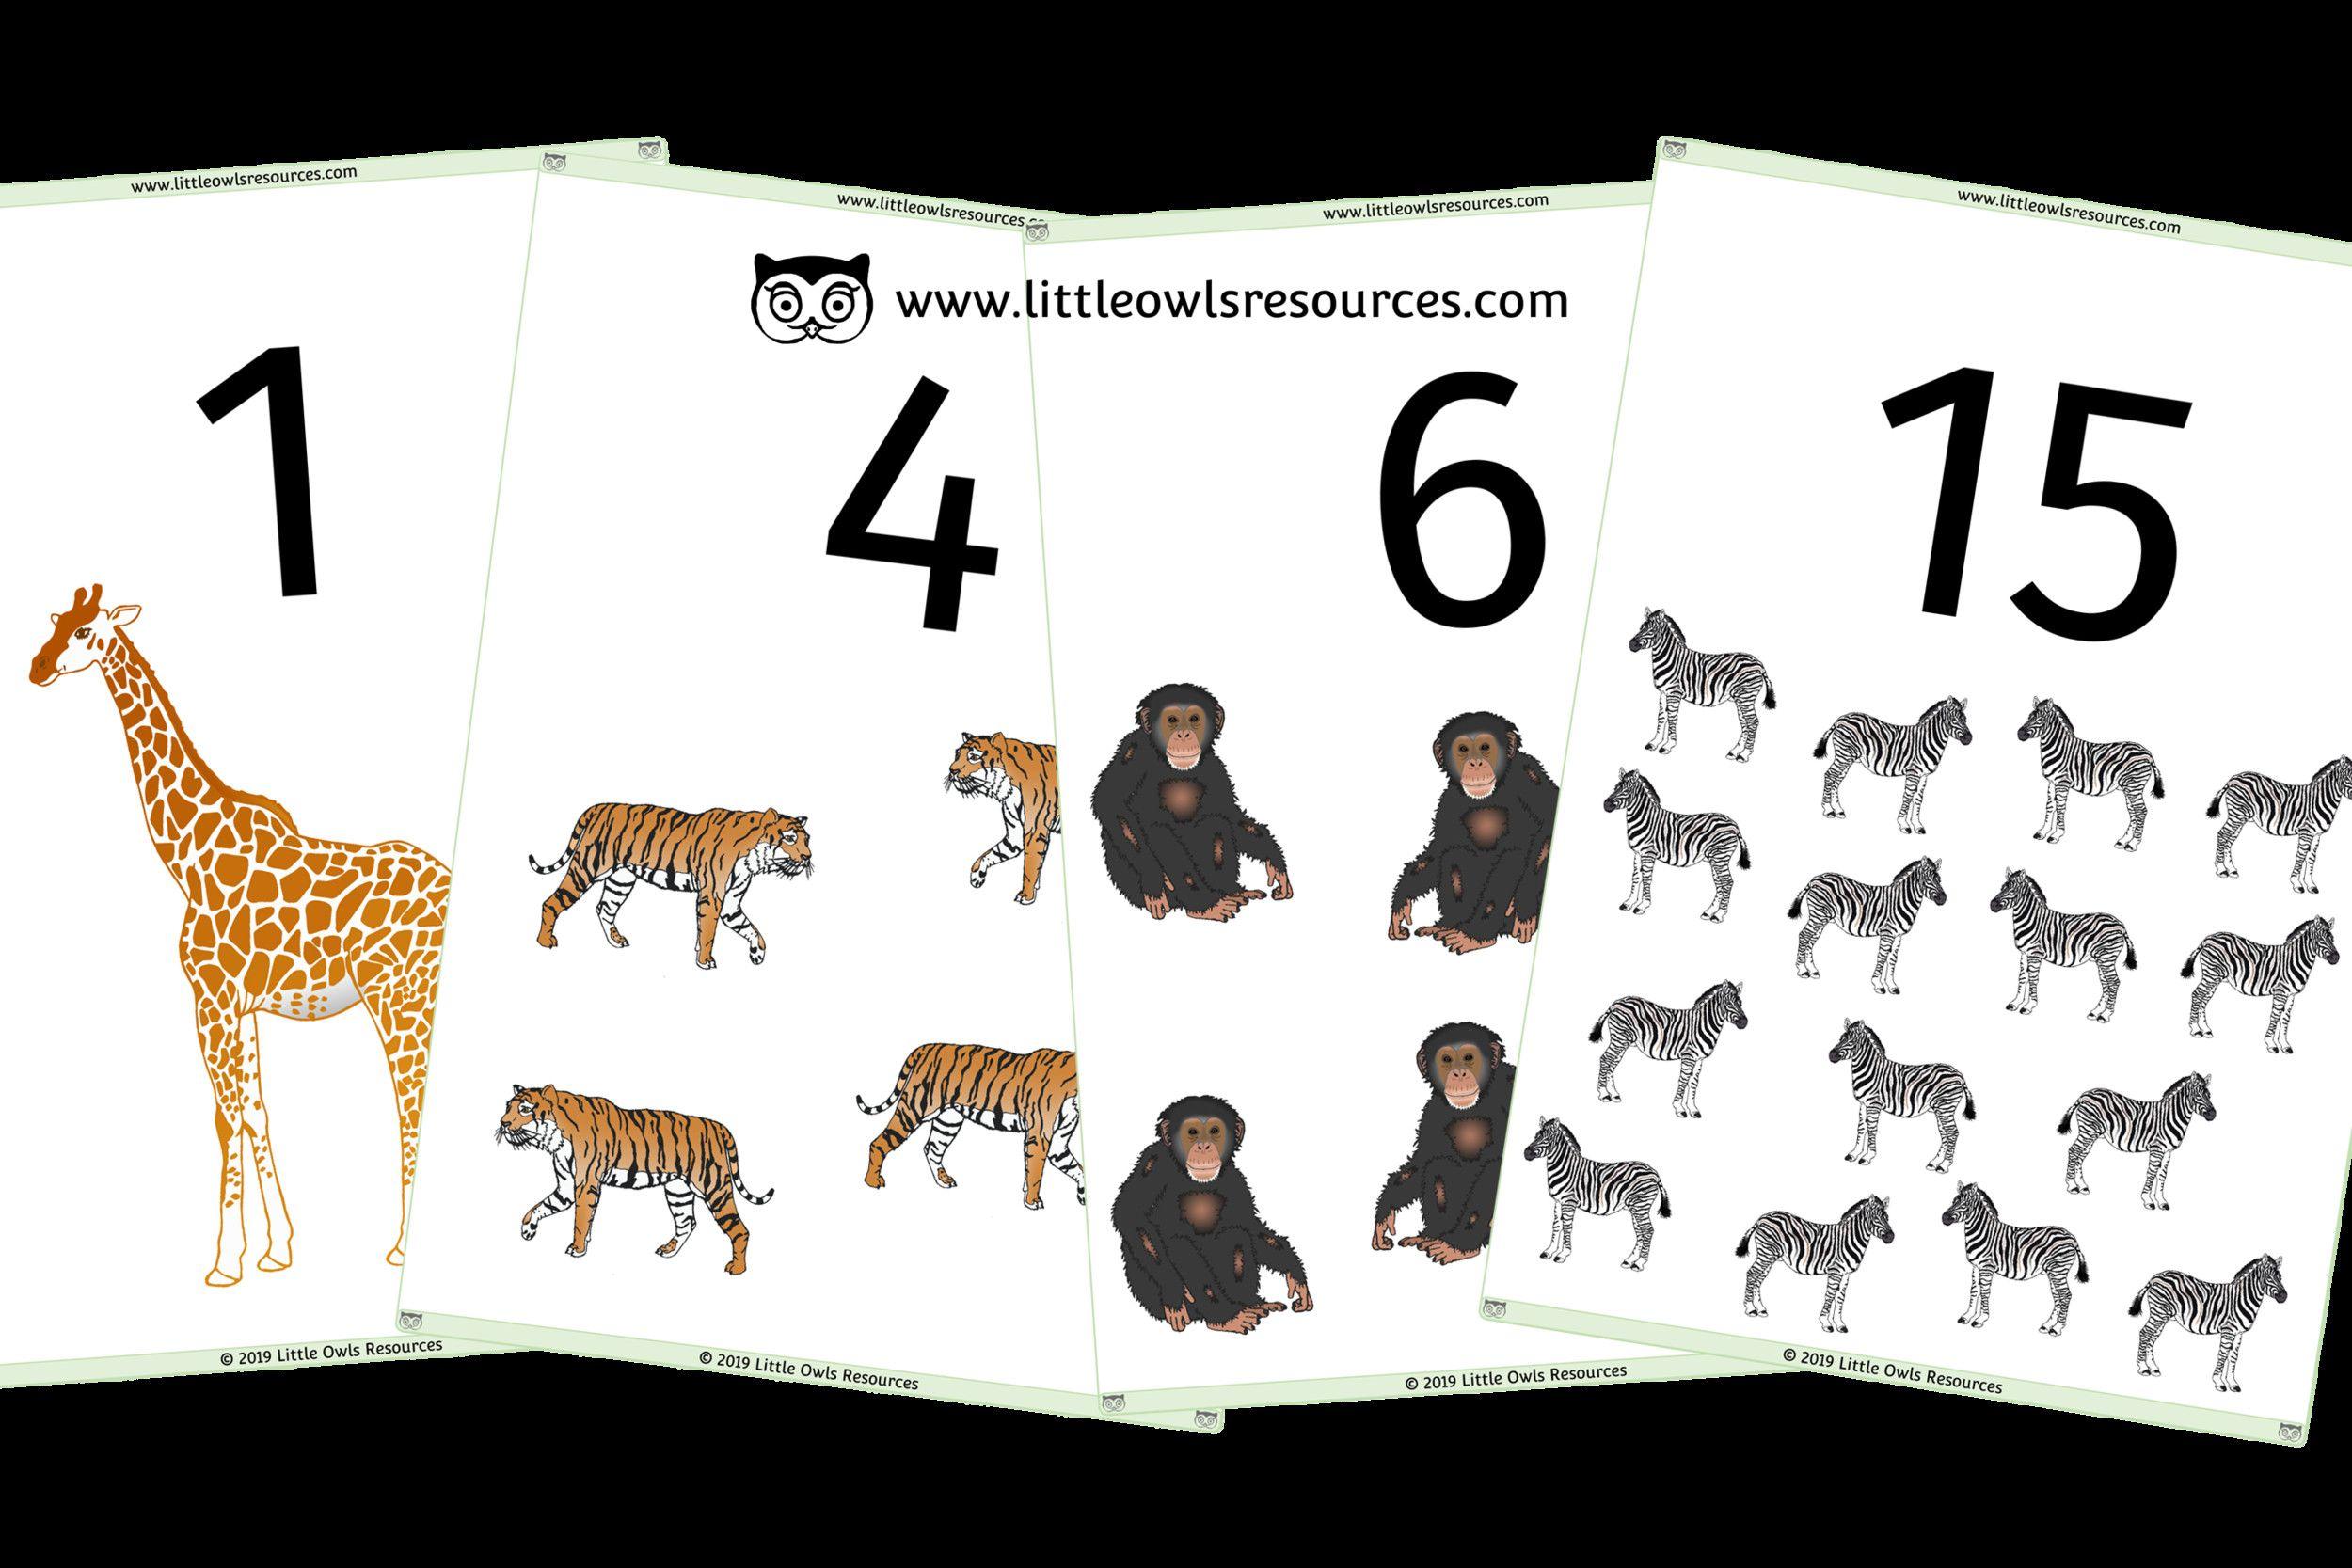 5 Farm Animals Flashcards For Kids 0 20 Count Zoo Animals Cover Zoo Animals Animal Flashcards Farm Animals Preschool [ 1667 x 2500 Pixel ]